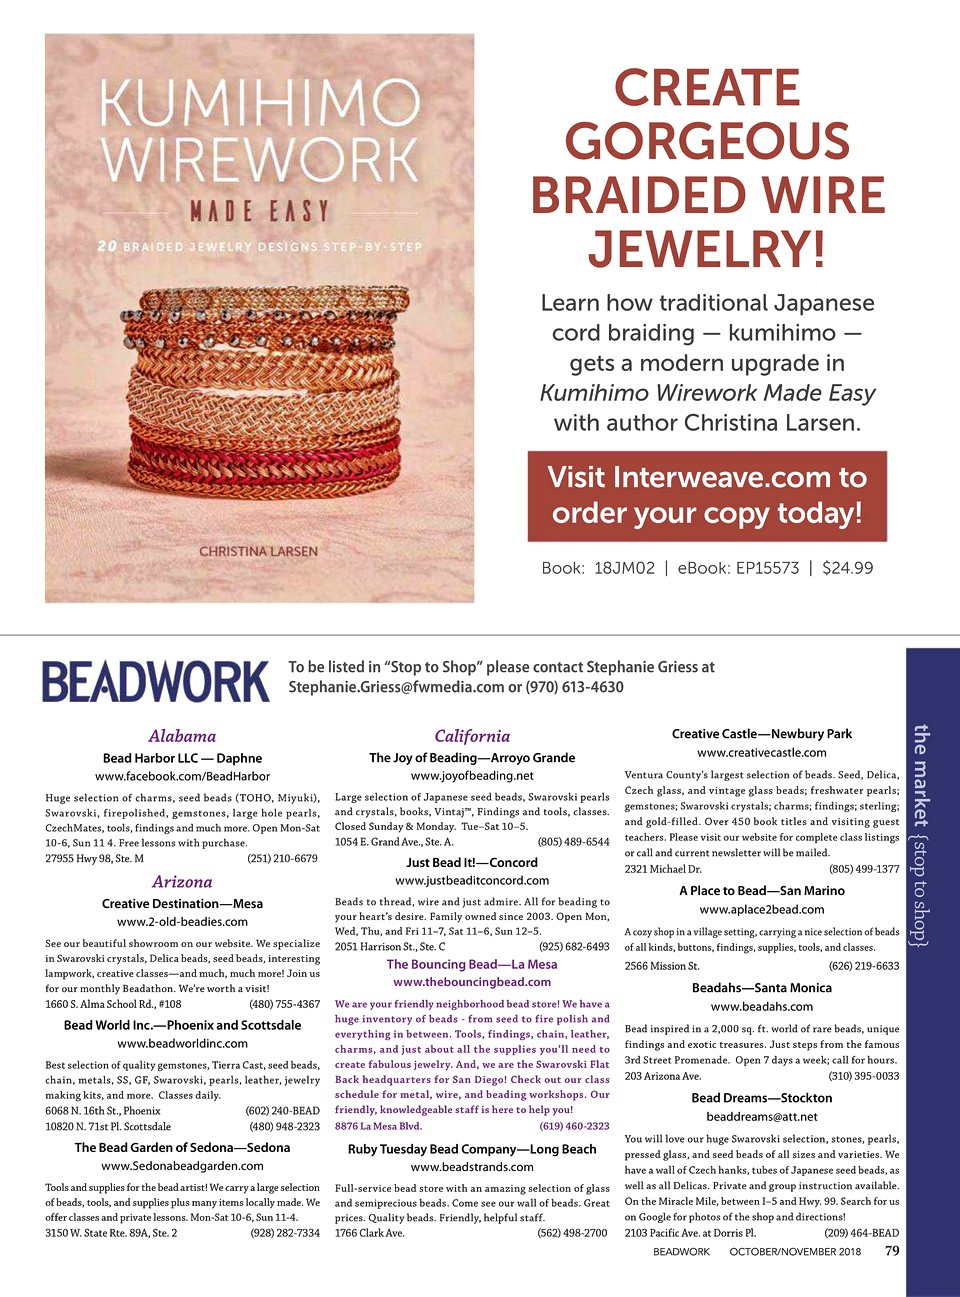 Beadwork - November 2018-82